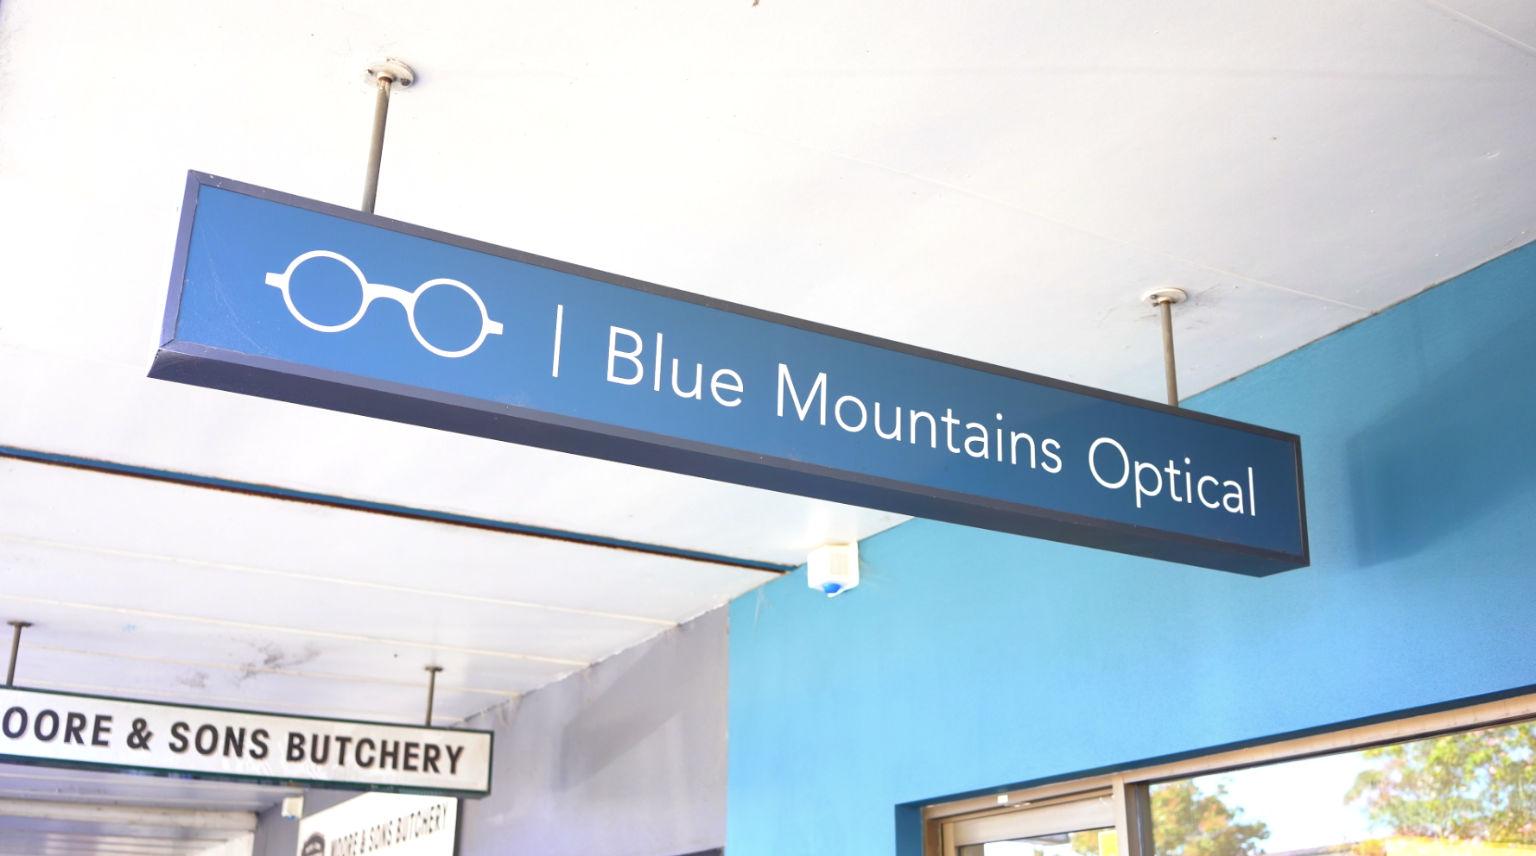 Blue Mountains Optical